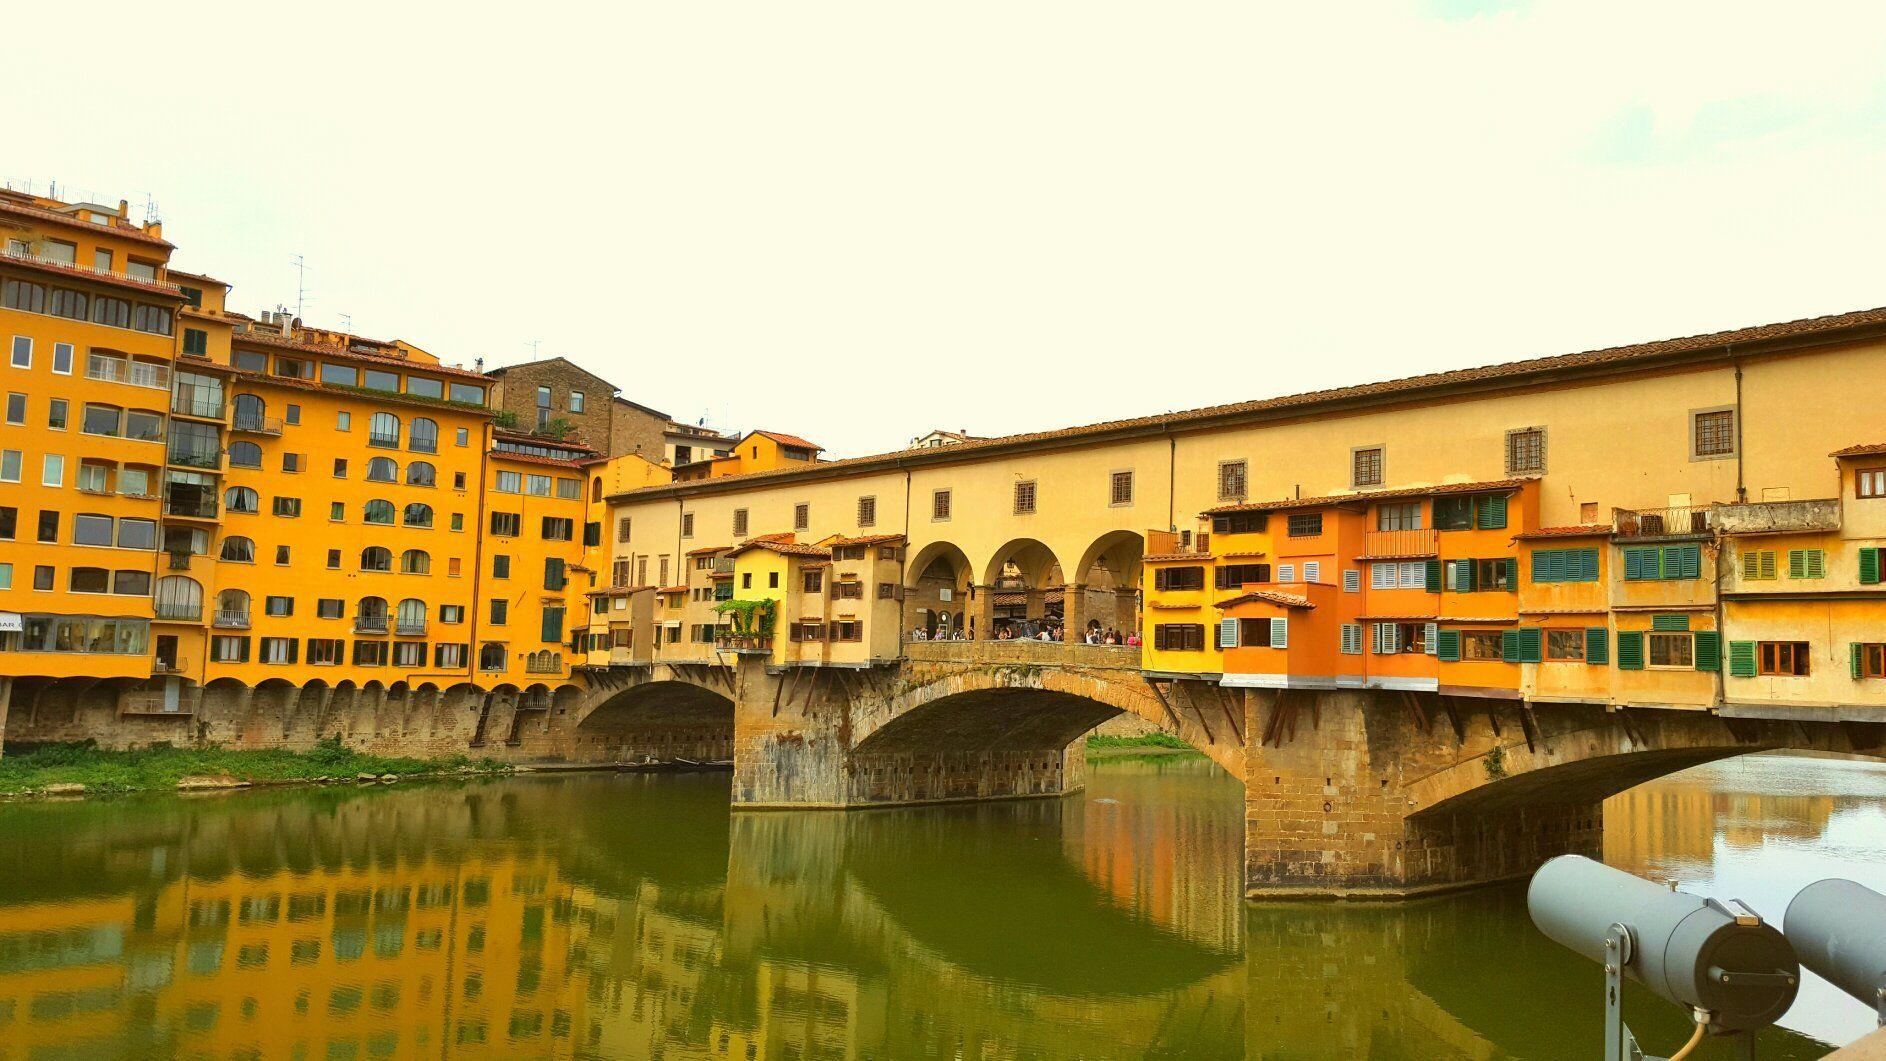 **Ponte Vecchio (Florence, Italy): Top Tips Before You Go - TripAdvisor